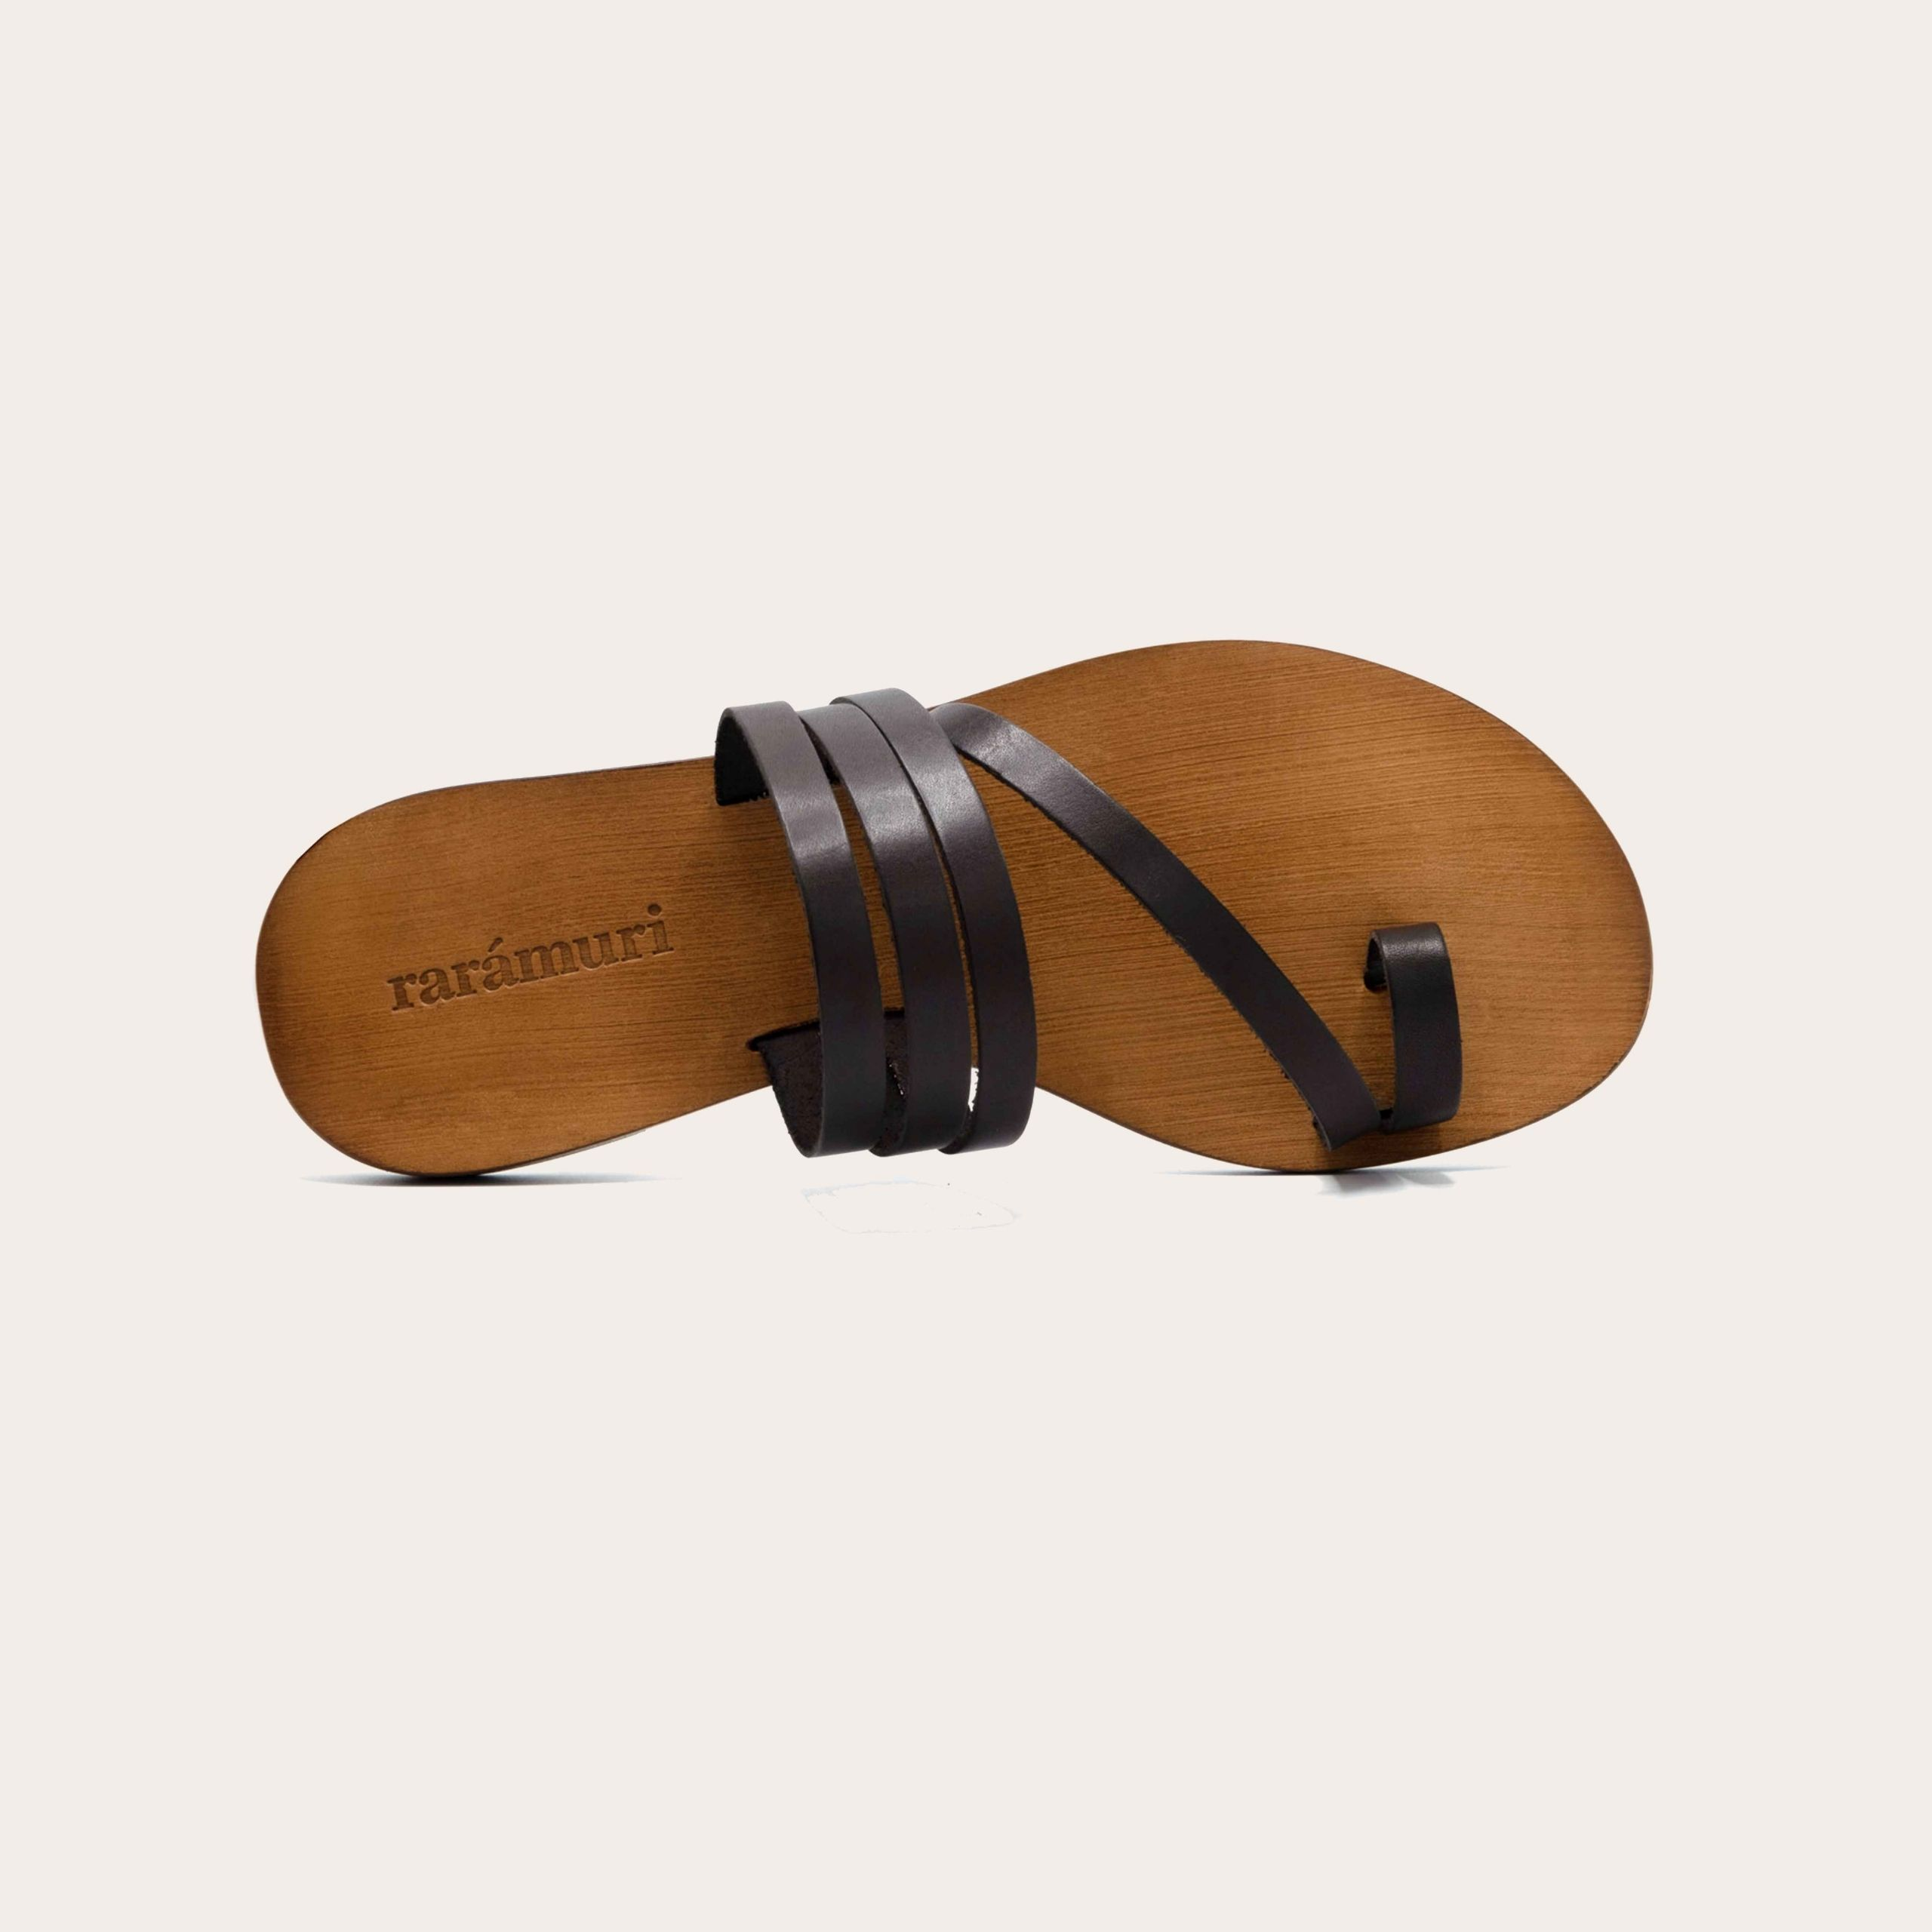 xico-brown_3_lintsandalen sandals travelsandals vegan sustainable sandals wikkelsandalen